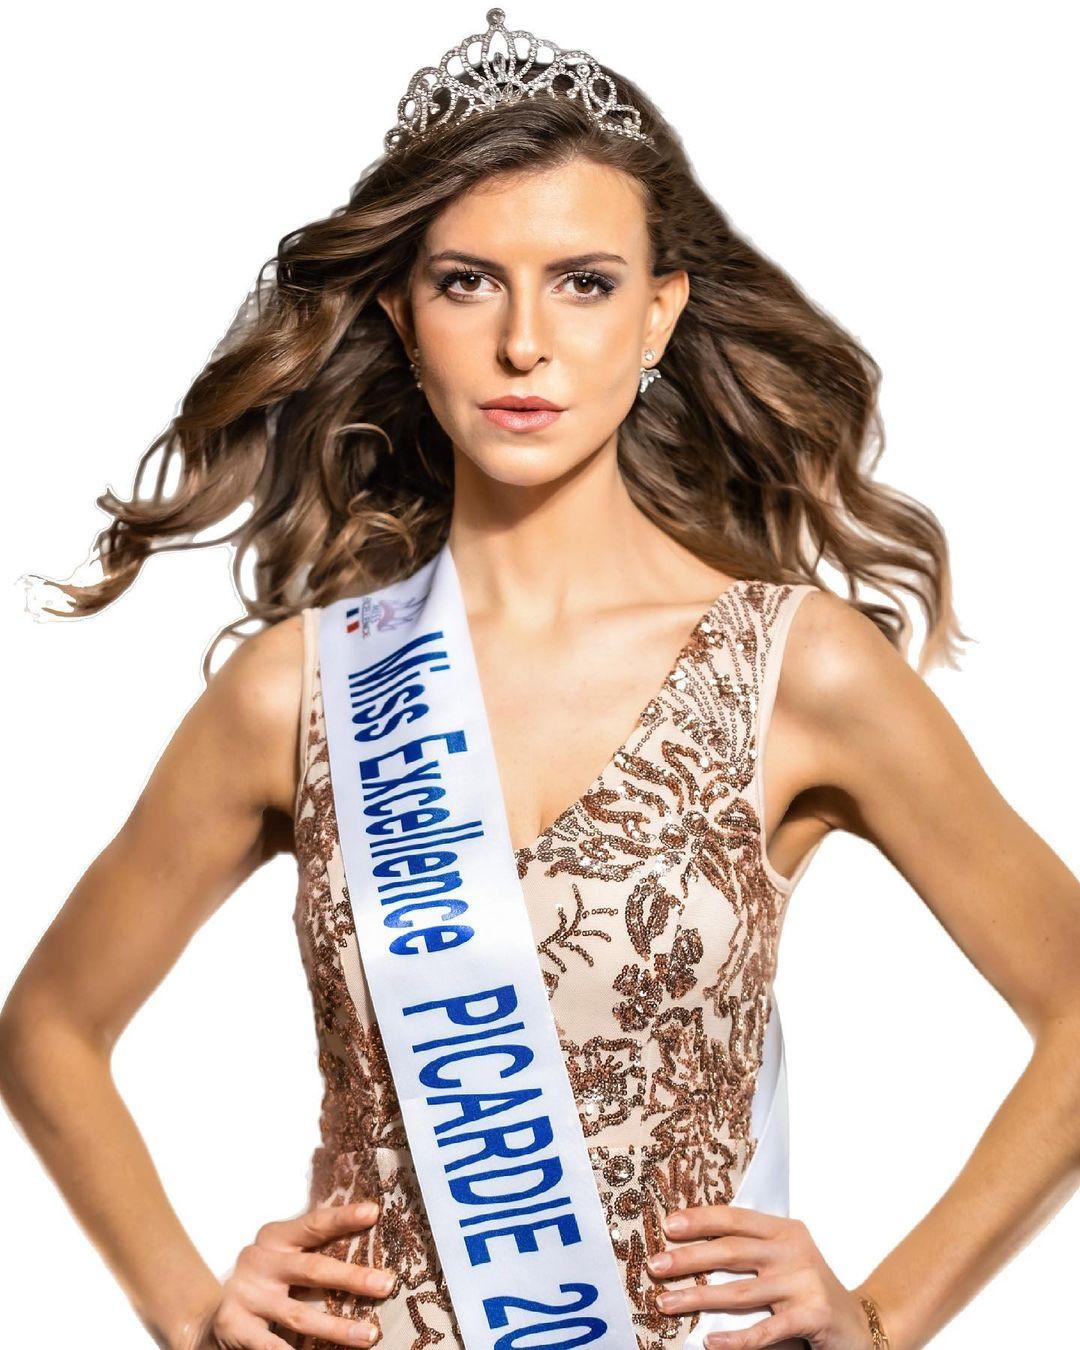 miss mayotte vence miss excellence france 2021.  - Página 2 BbOwhJ